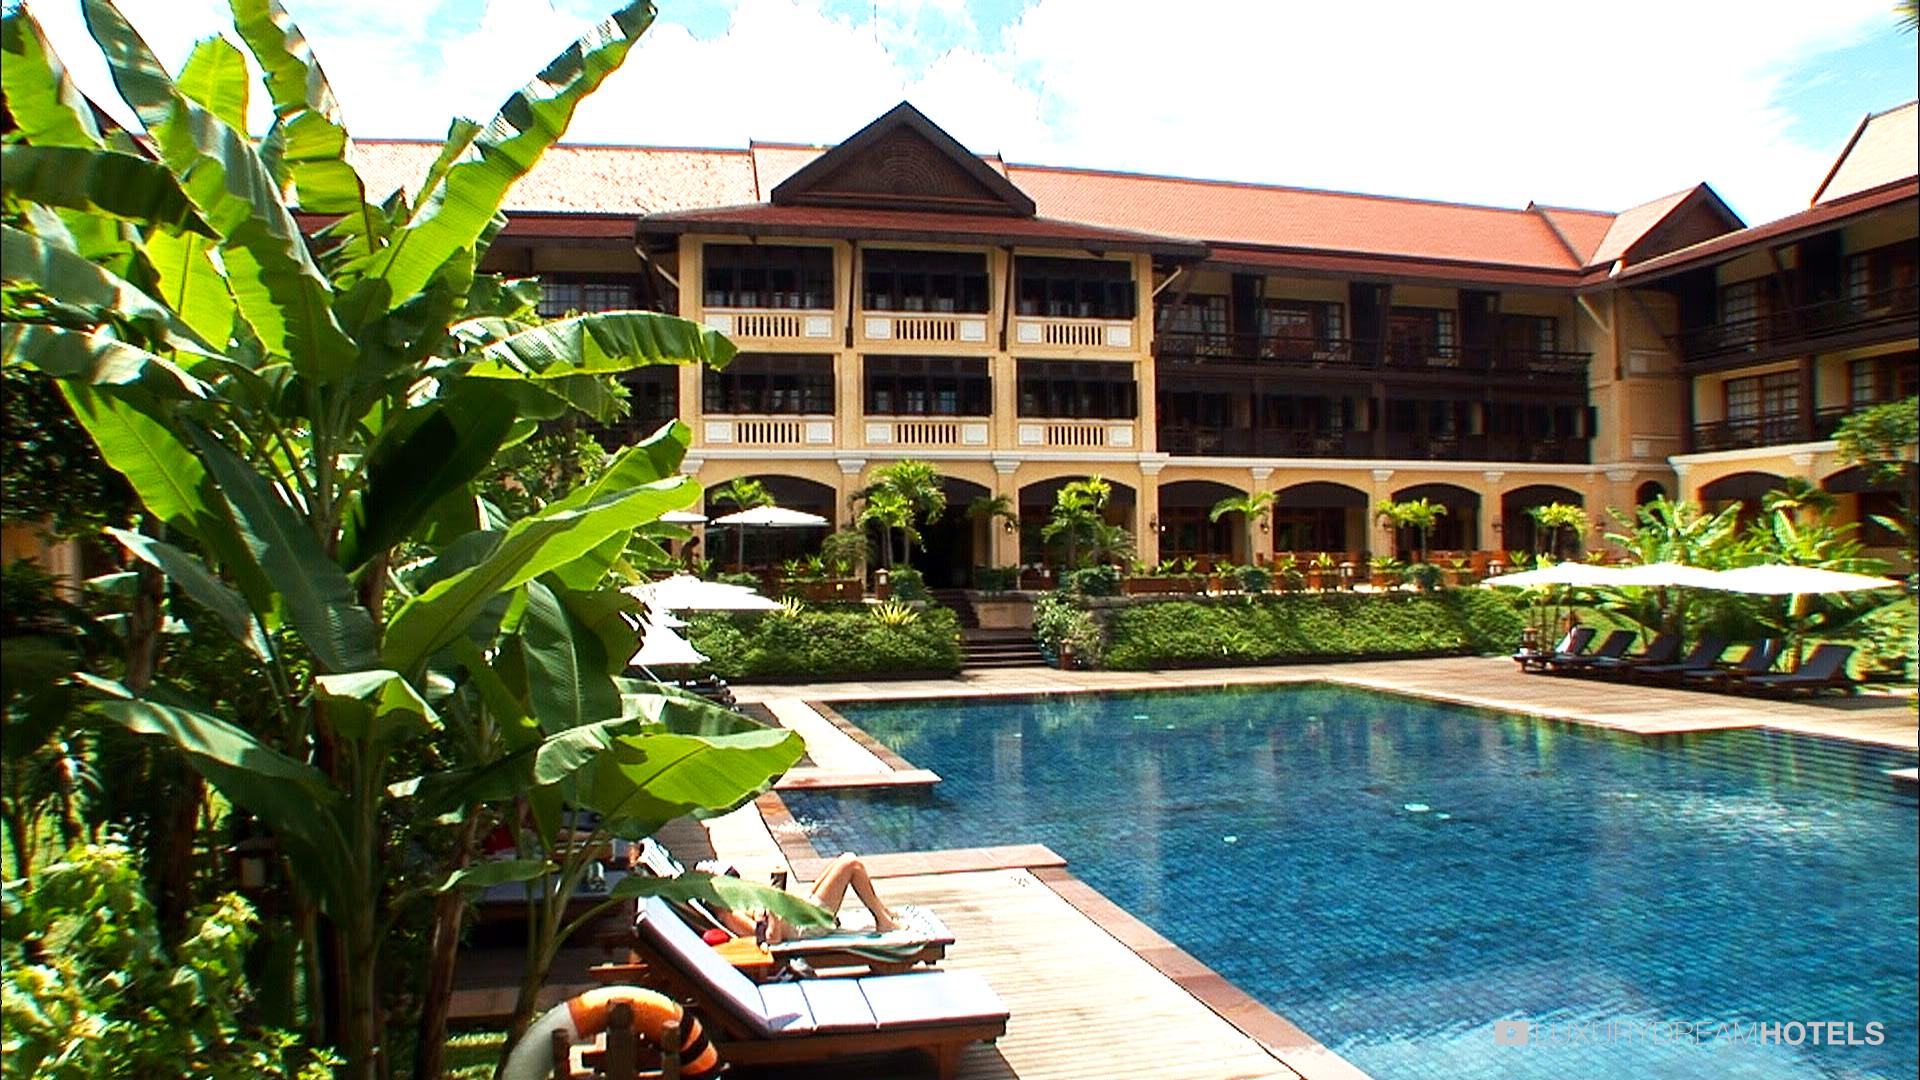 Angkor Palace Resort Spa Luxury Hotel Victoria Angkor Resort Spa Siem Reap Cambodia